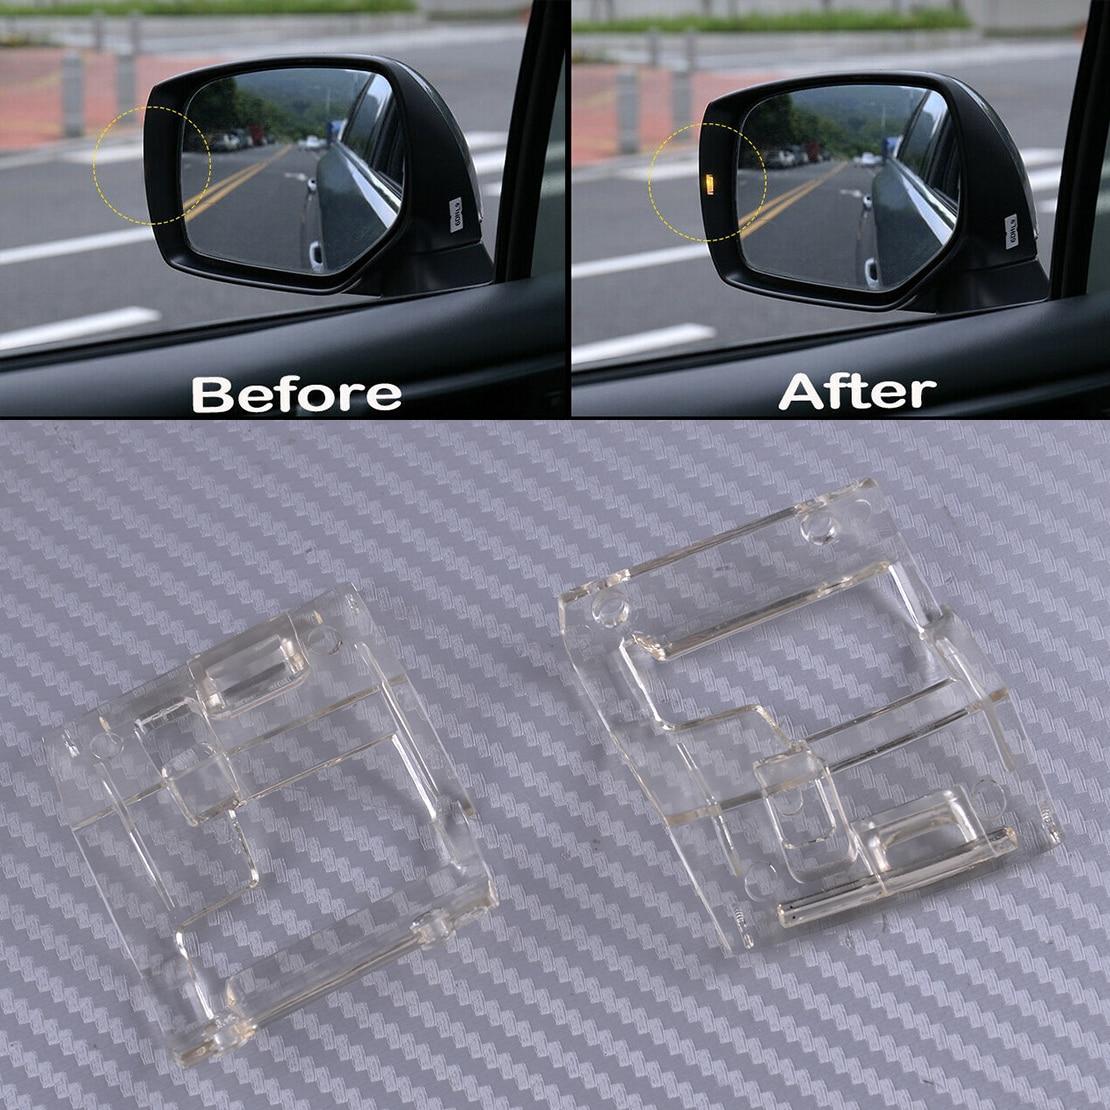 DWCX 2pcs PC Car Side Mirrors Assistant Turn Signal Light Lens Indicators Clear Fit For Subaru STI WRX 2015 2016 2017 2018 2019